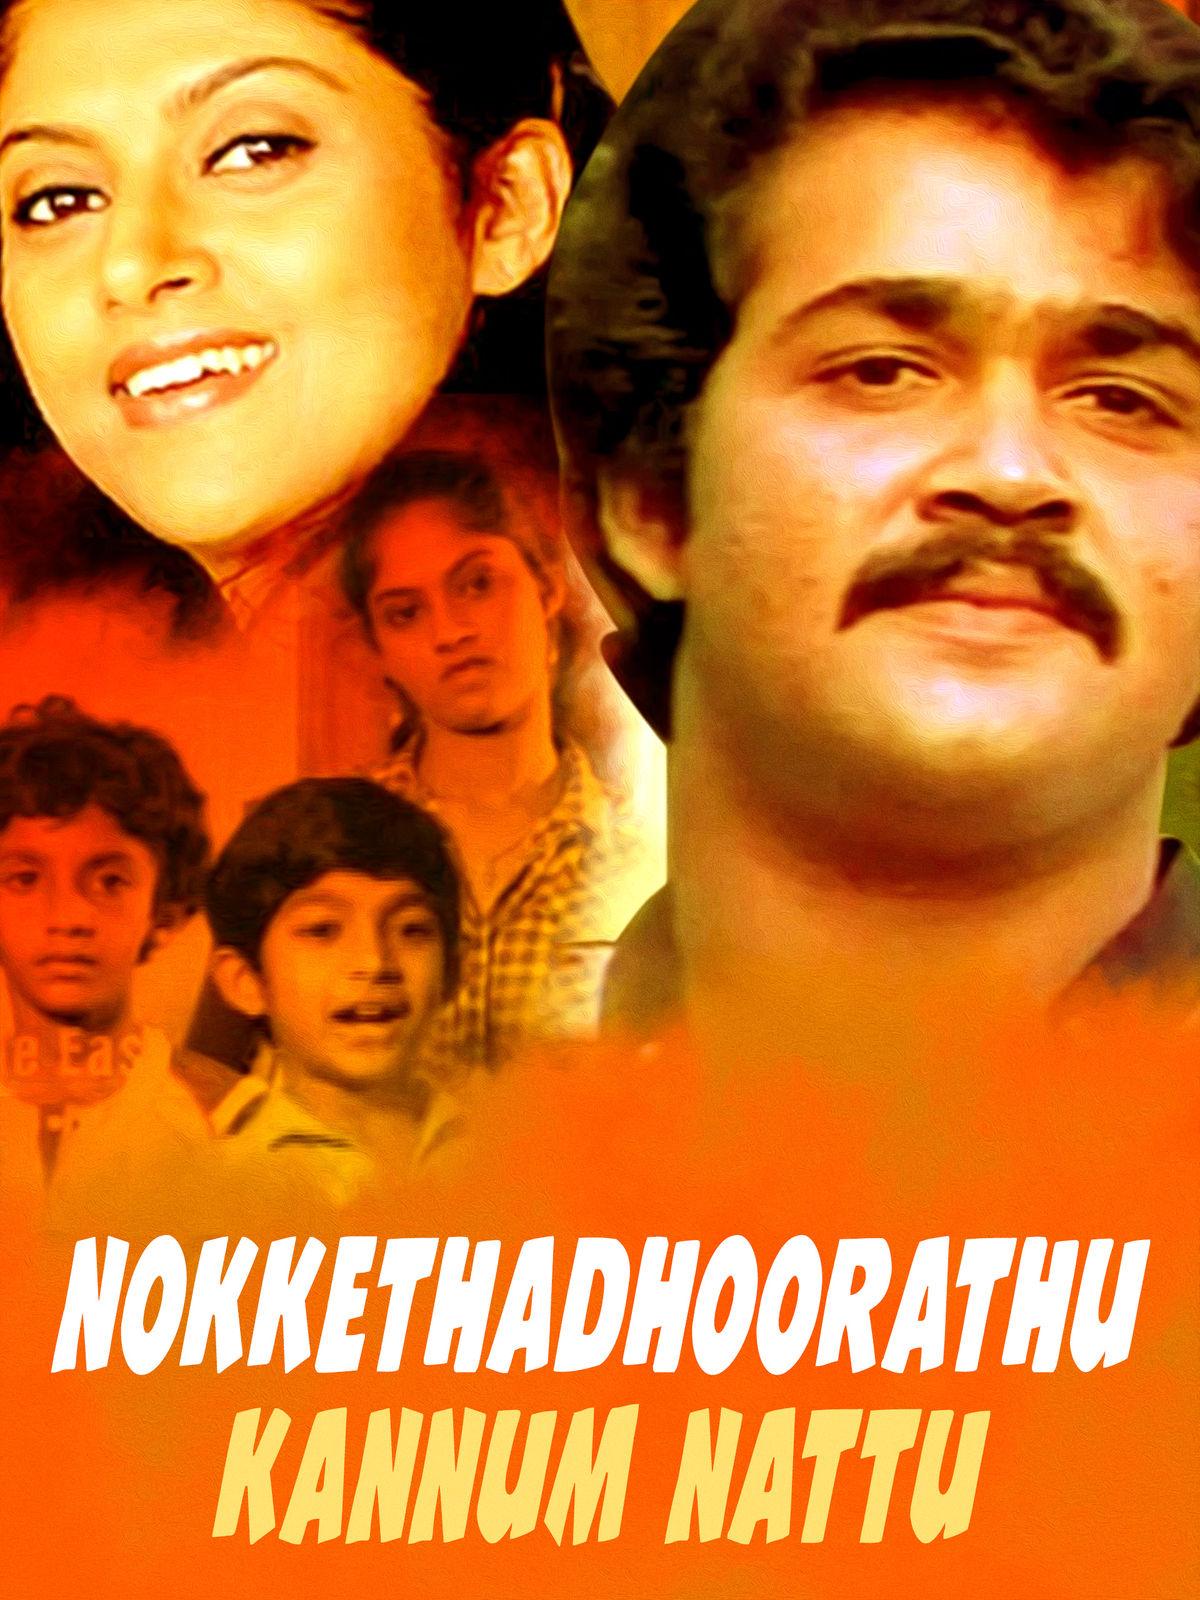 Maniyanpilla Raju Best Movies, TV Shows and Web Series List